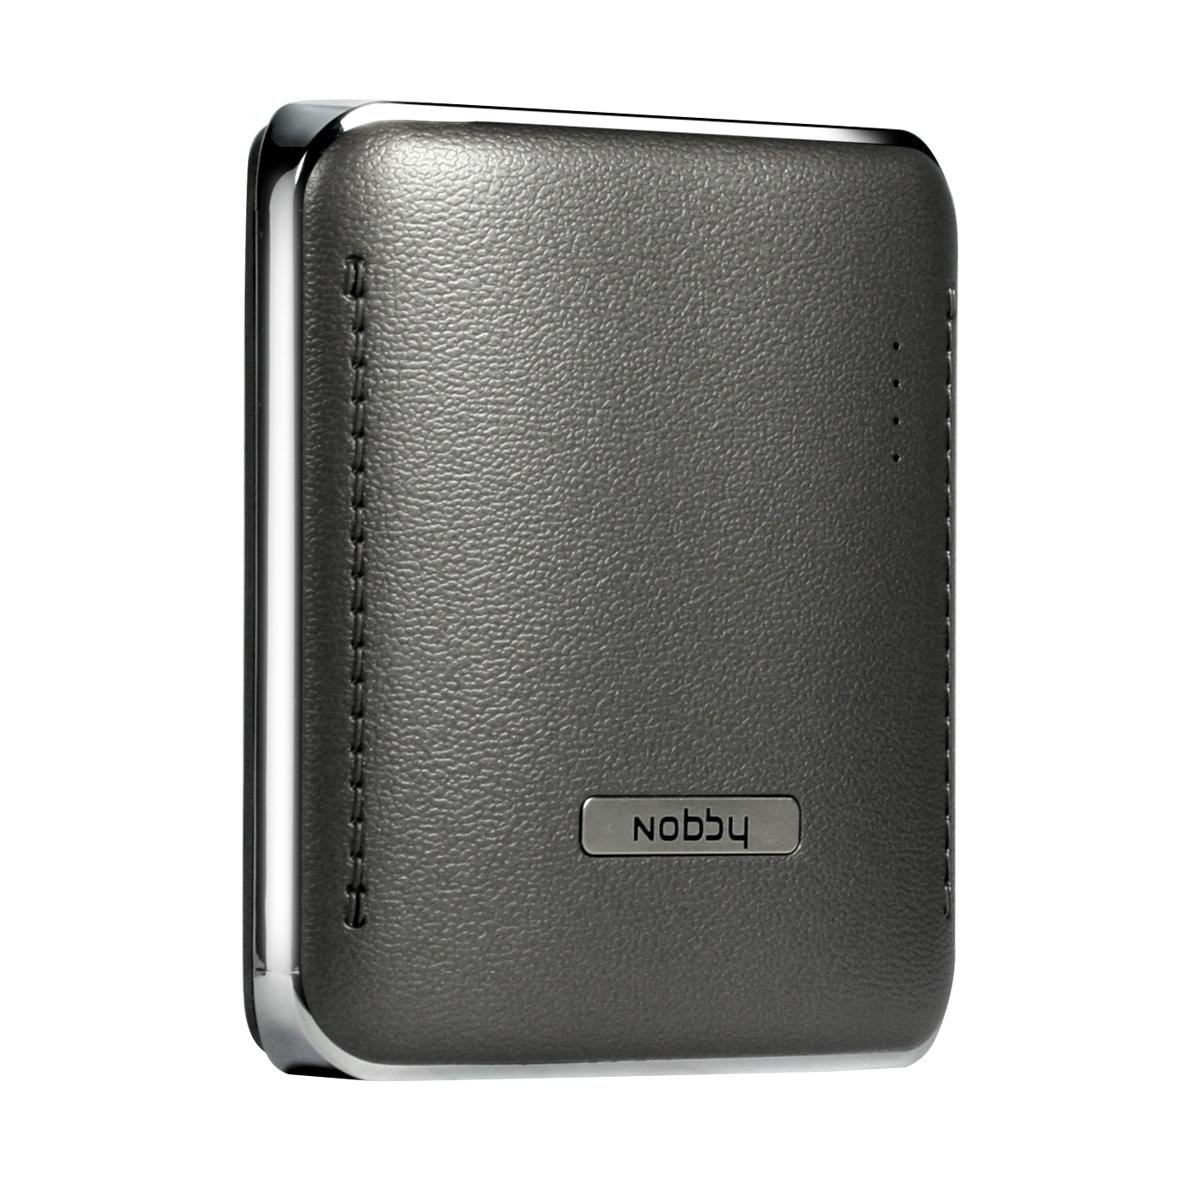 Nobby Comfort 015-001, Grey внешний аккумулятор (4000 mAh) аккумулятор nobby slim 025 001 4000 mah usb 1 2а black 09282